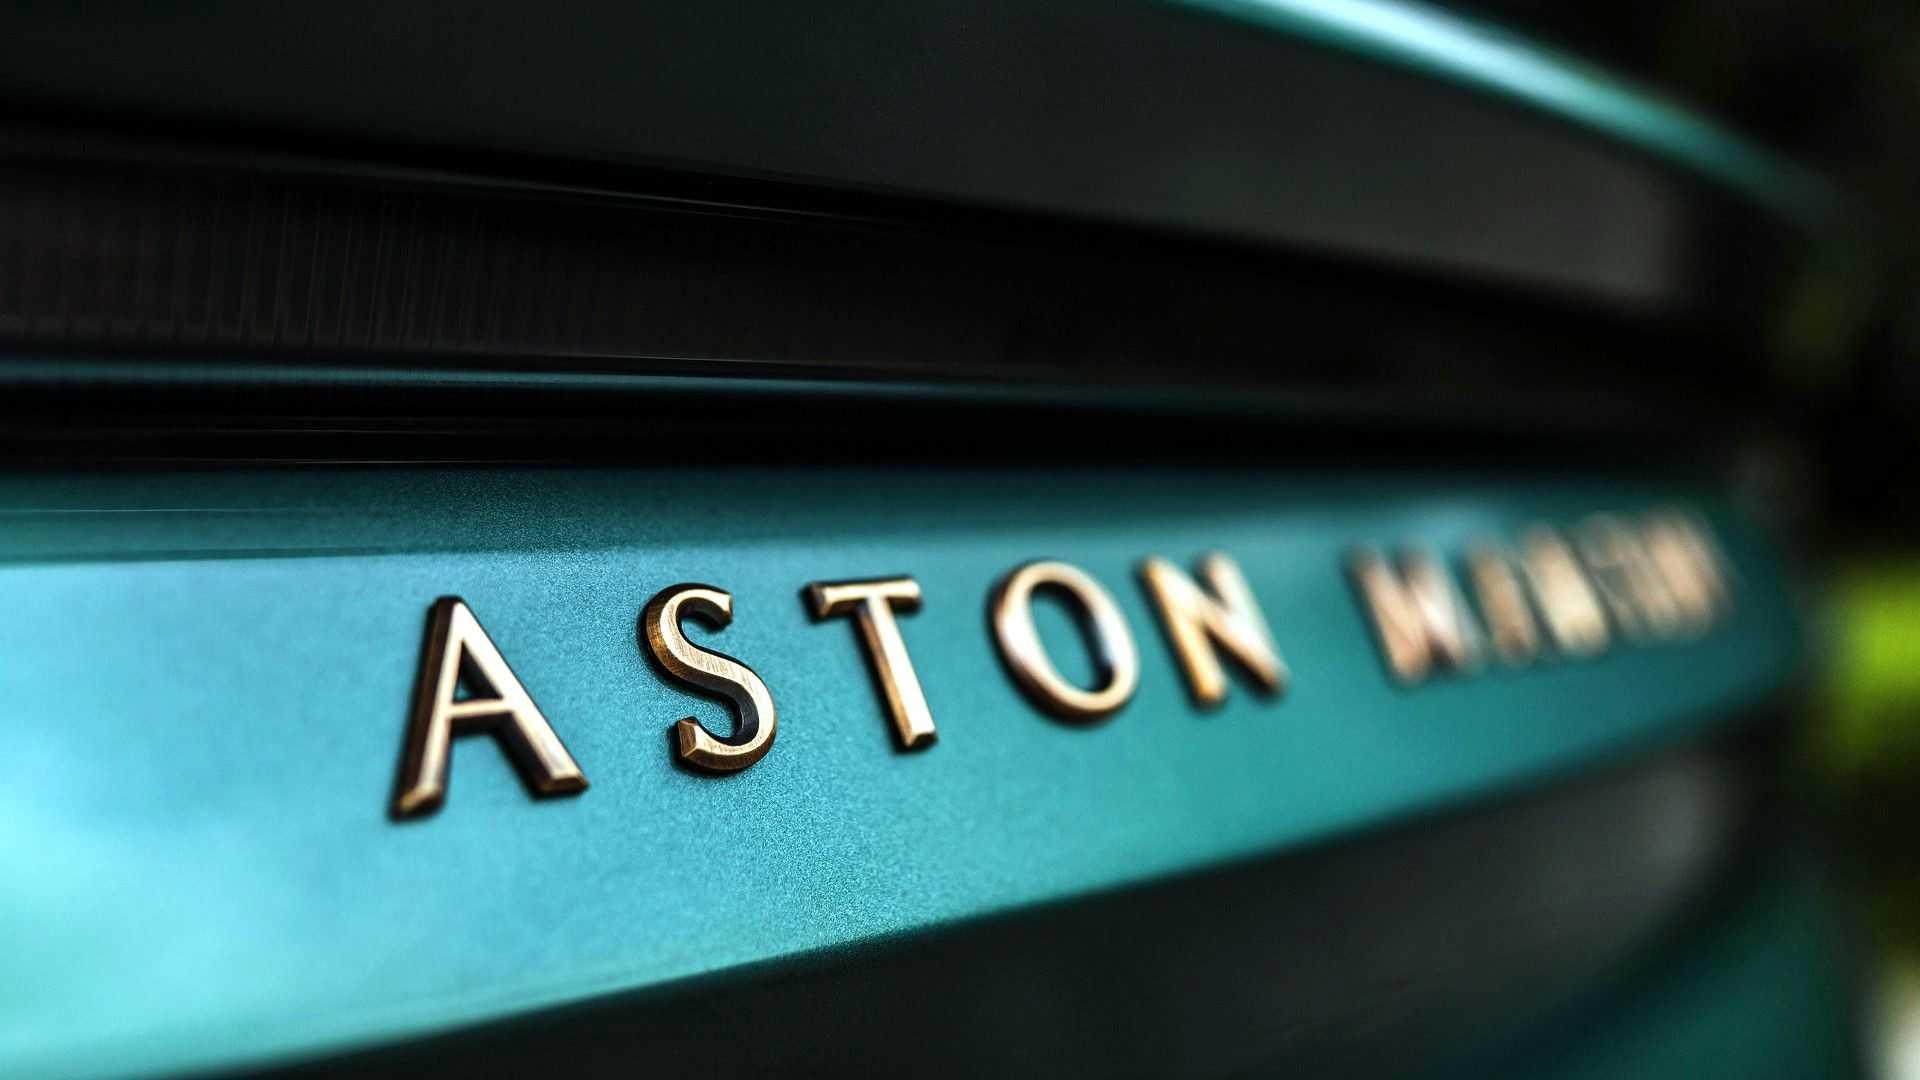 aston-martin-lagonda-dbs-59-edition-3